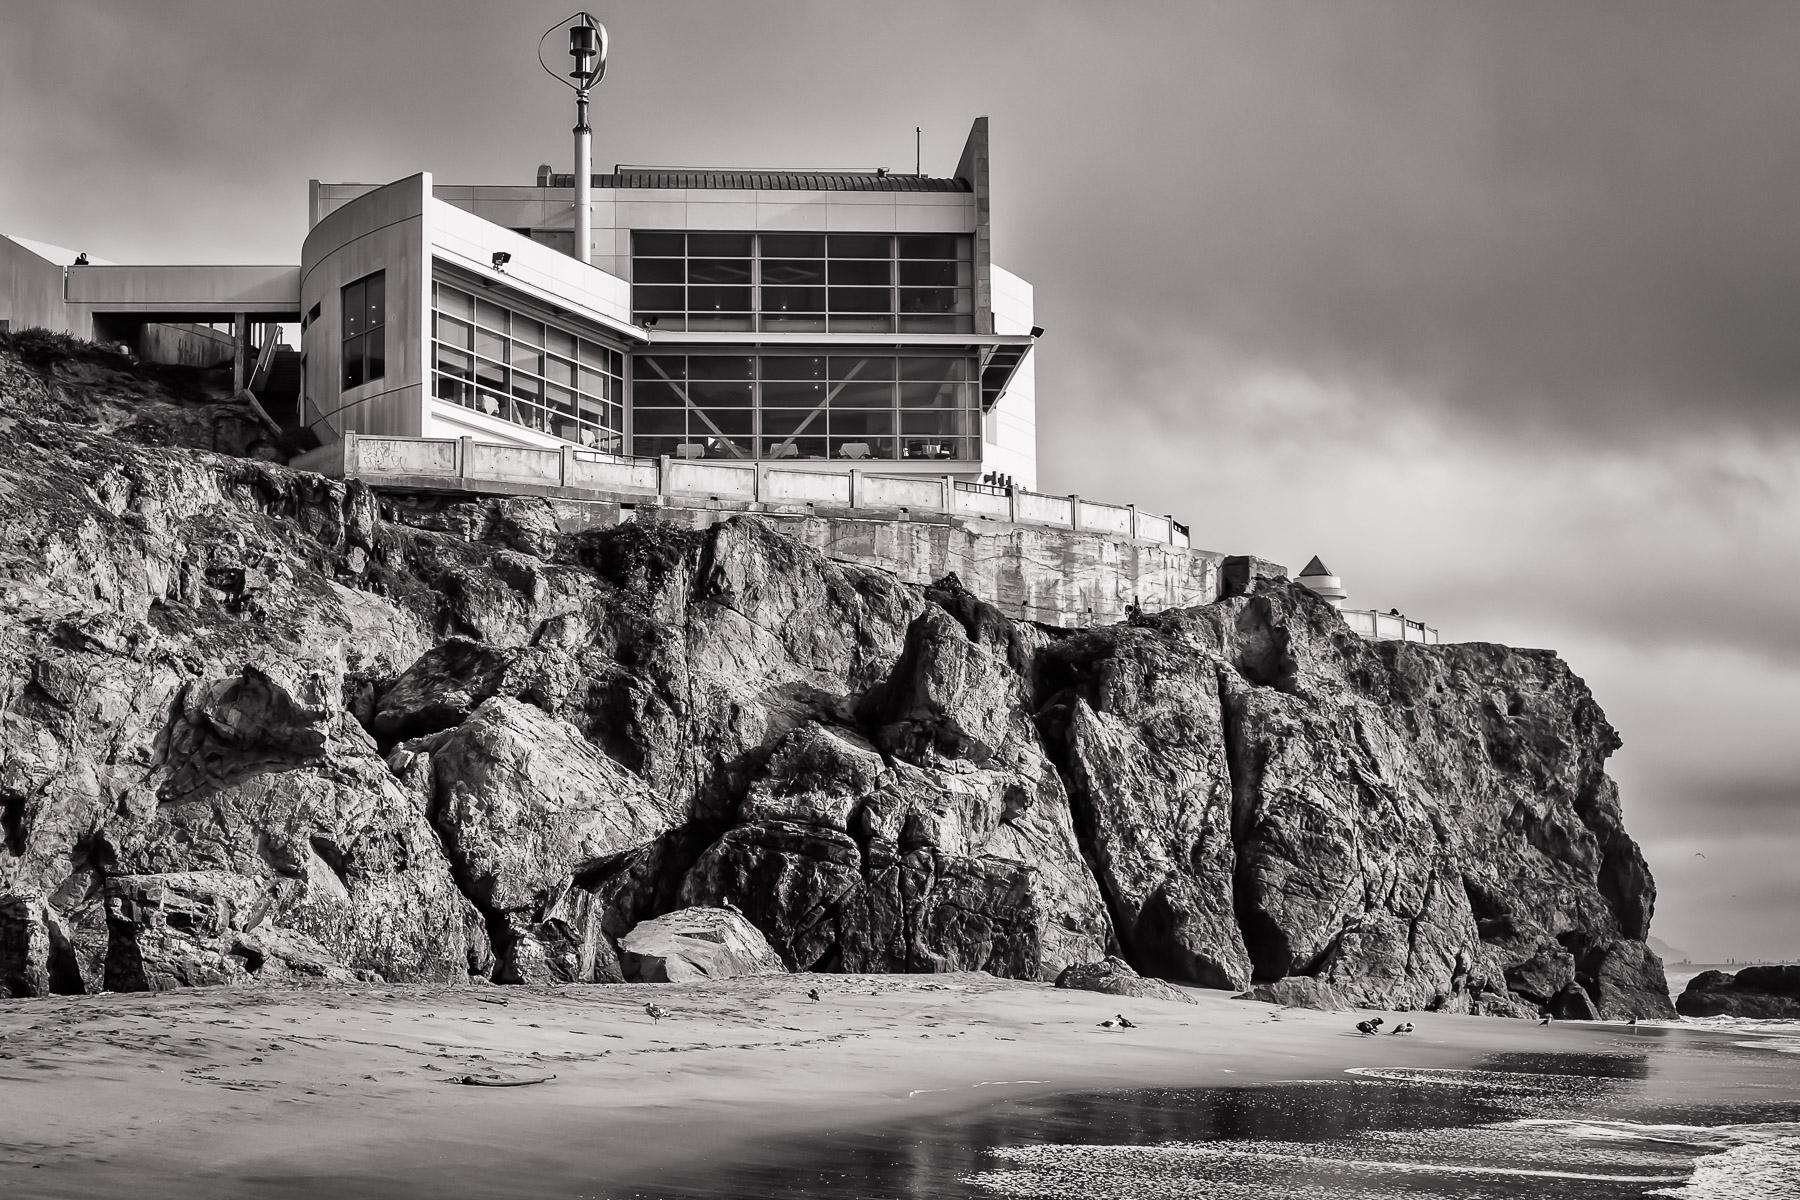 Cliff House modern wing histori - mattgharvey | ello